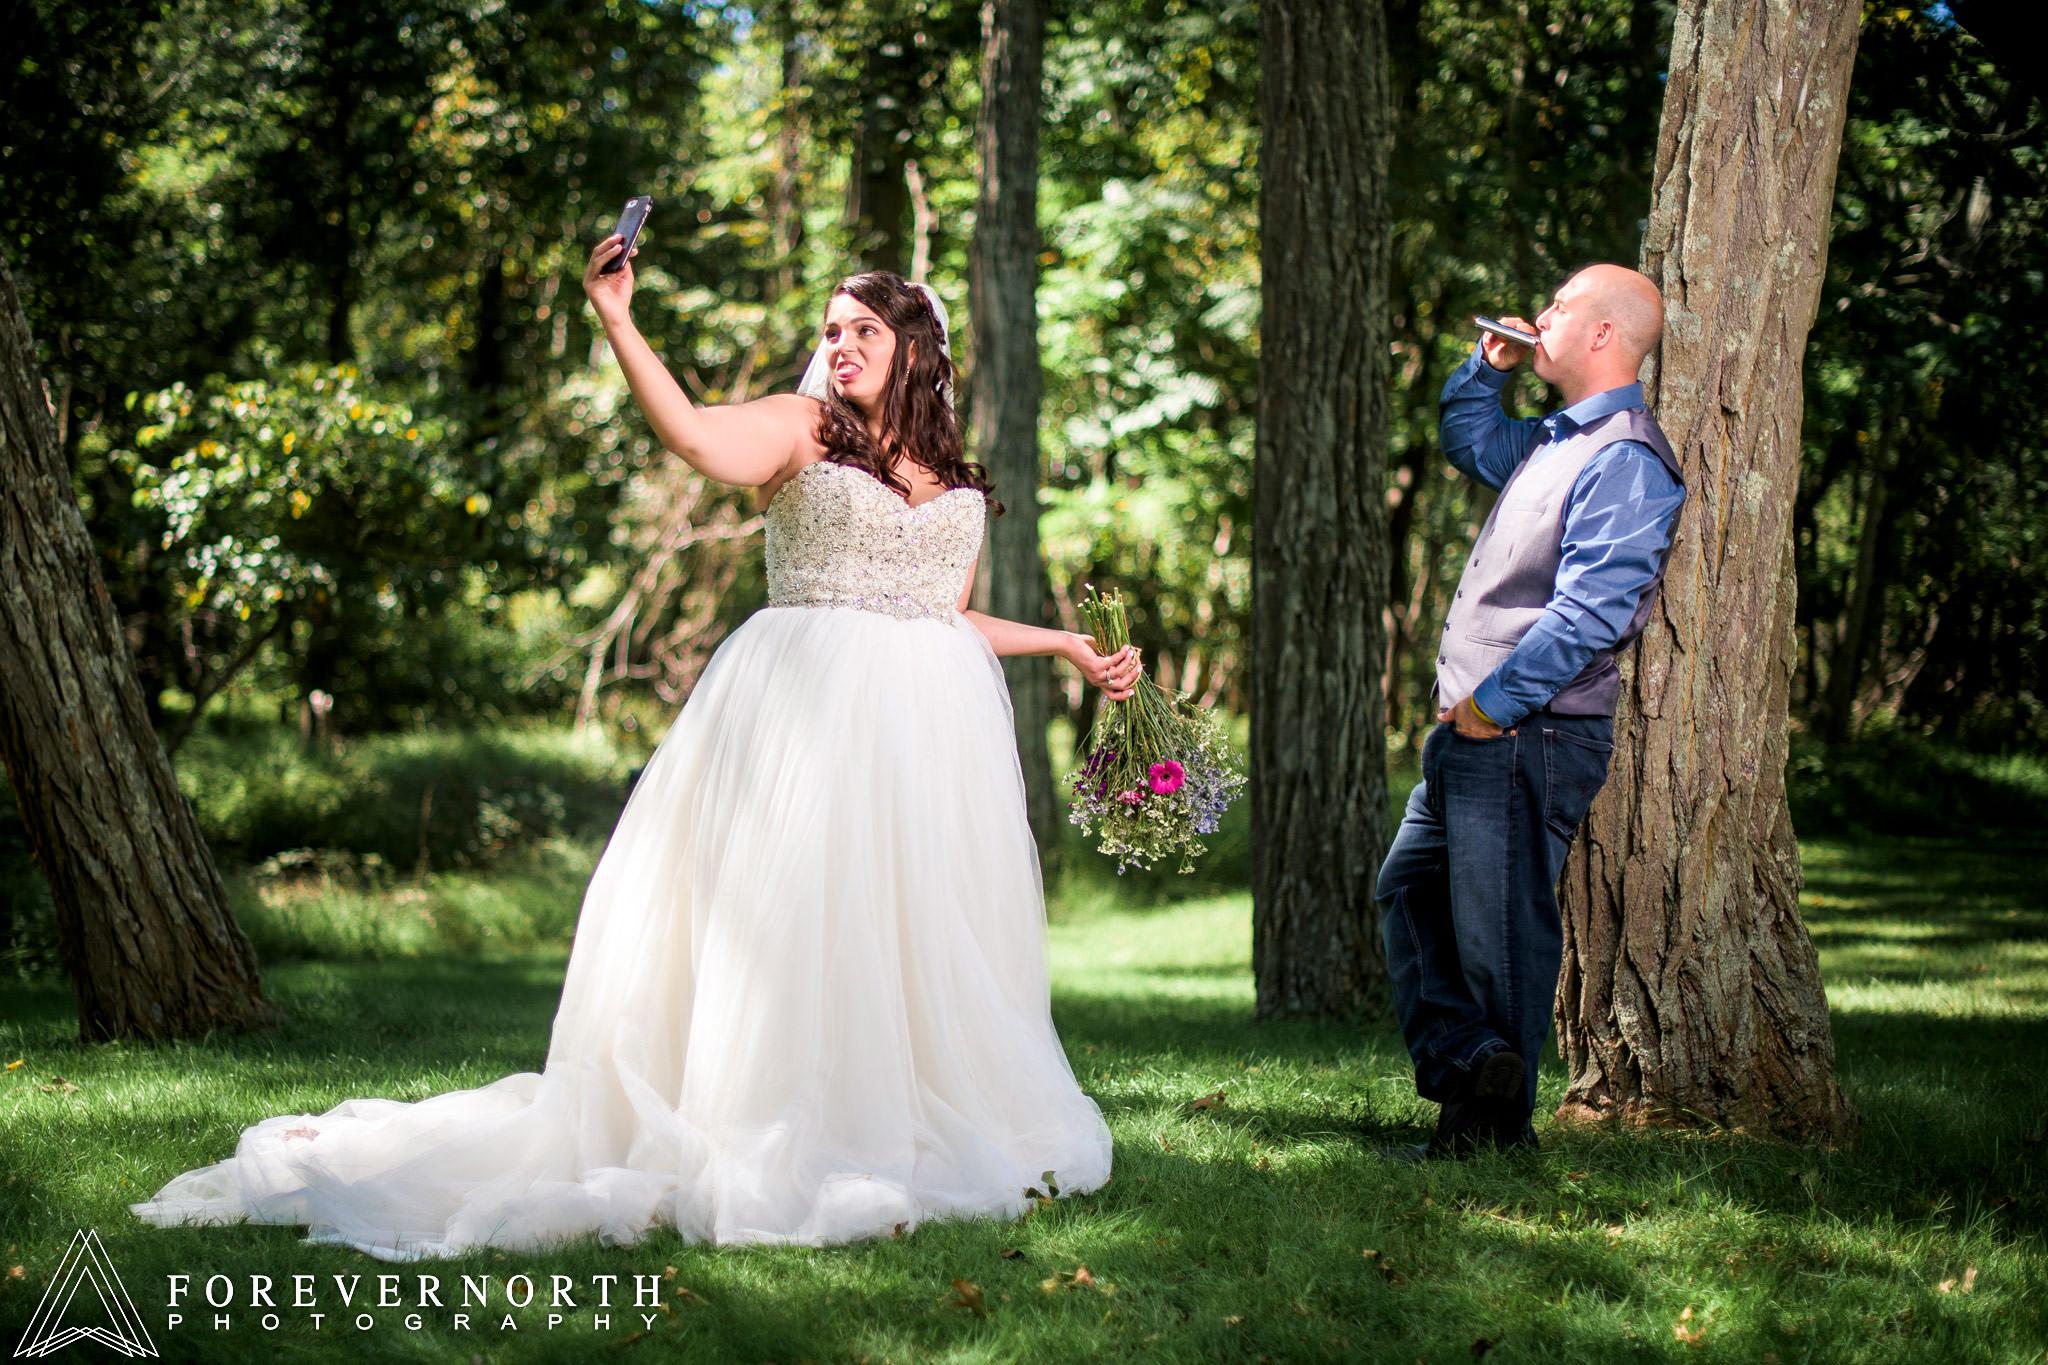 Brown-Allaire-State-Park-Wedding-Photographer-28.JPG